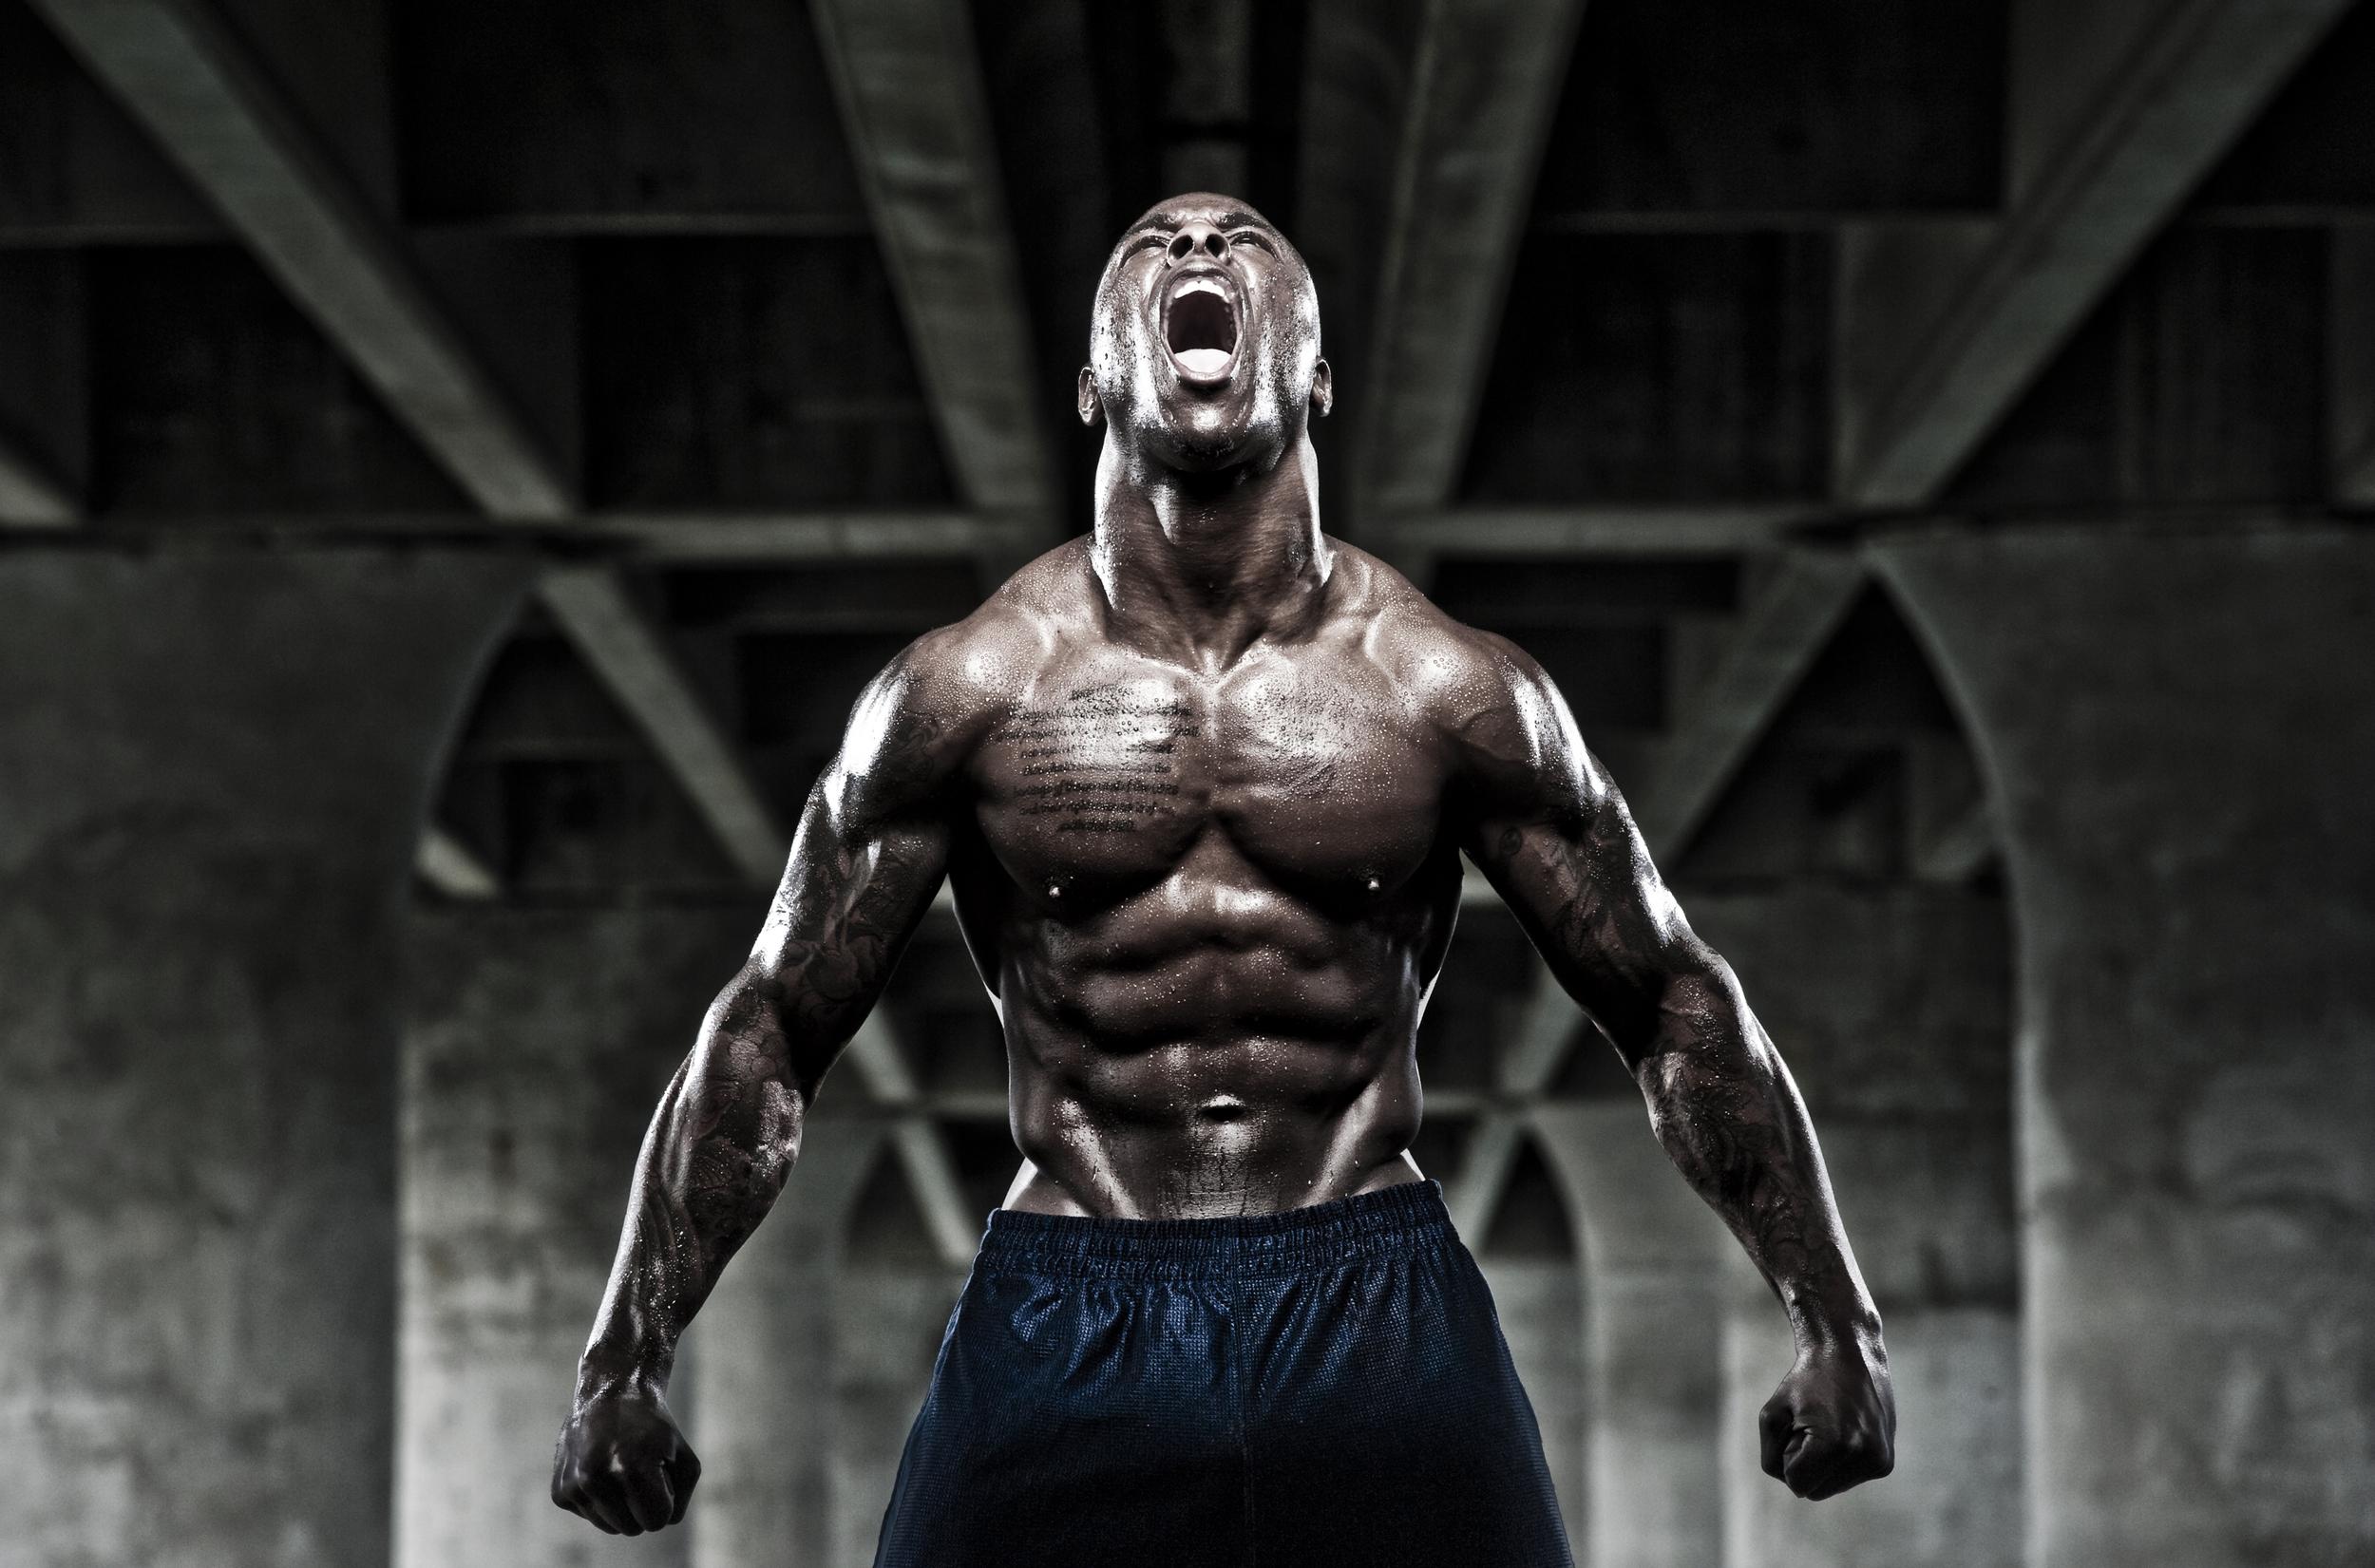 Portrait of a bodybuilder© Rob Hammer